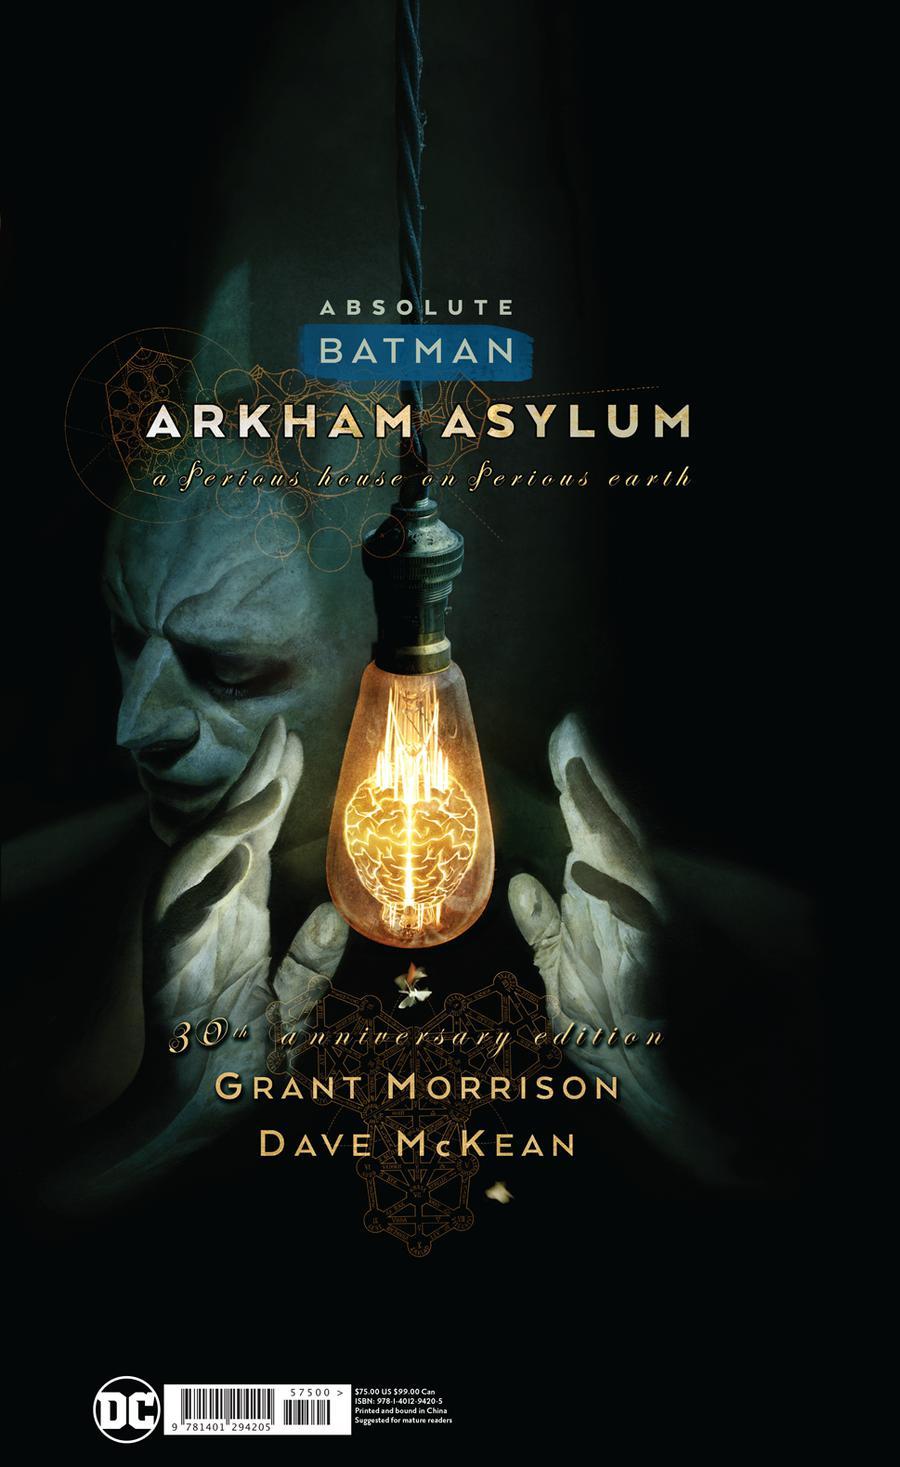 Absolute Batman Arkham Asylum 30th Anniversary Edition HC